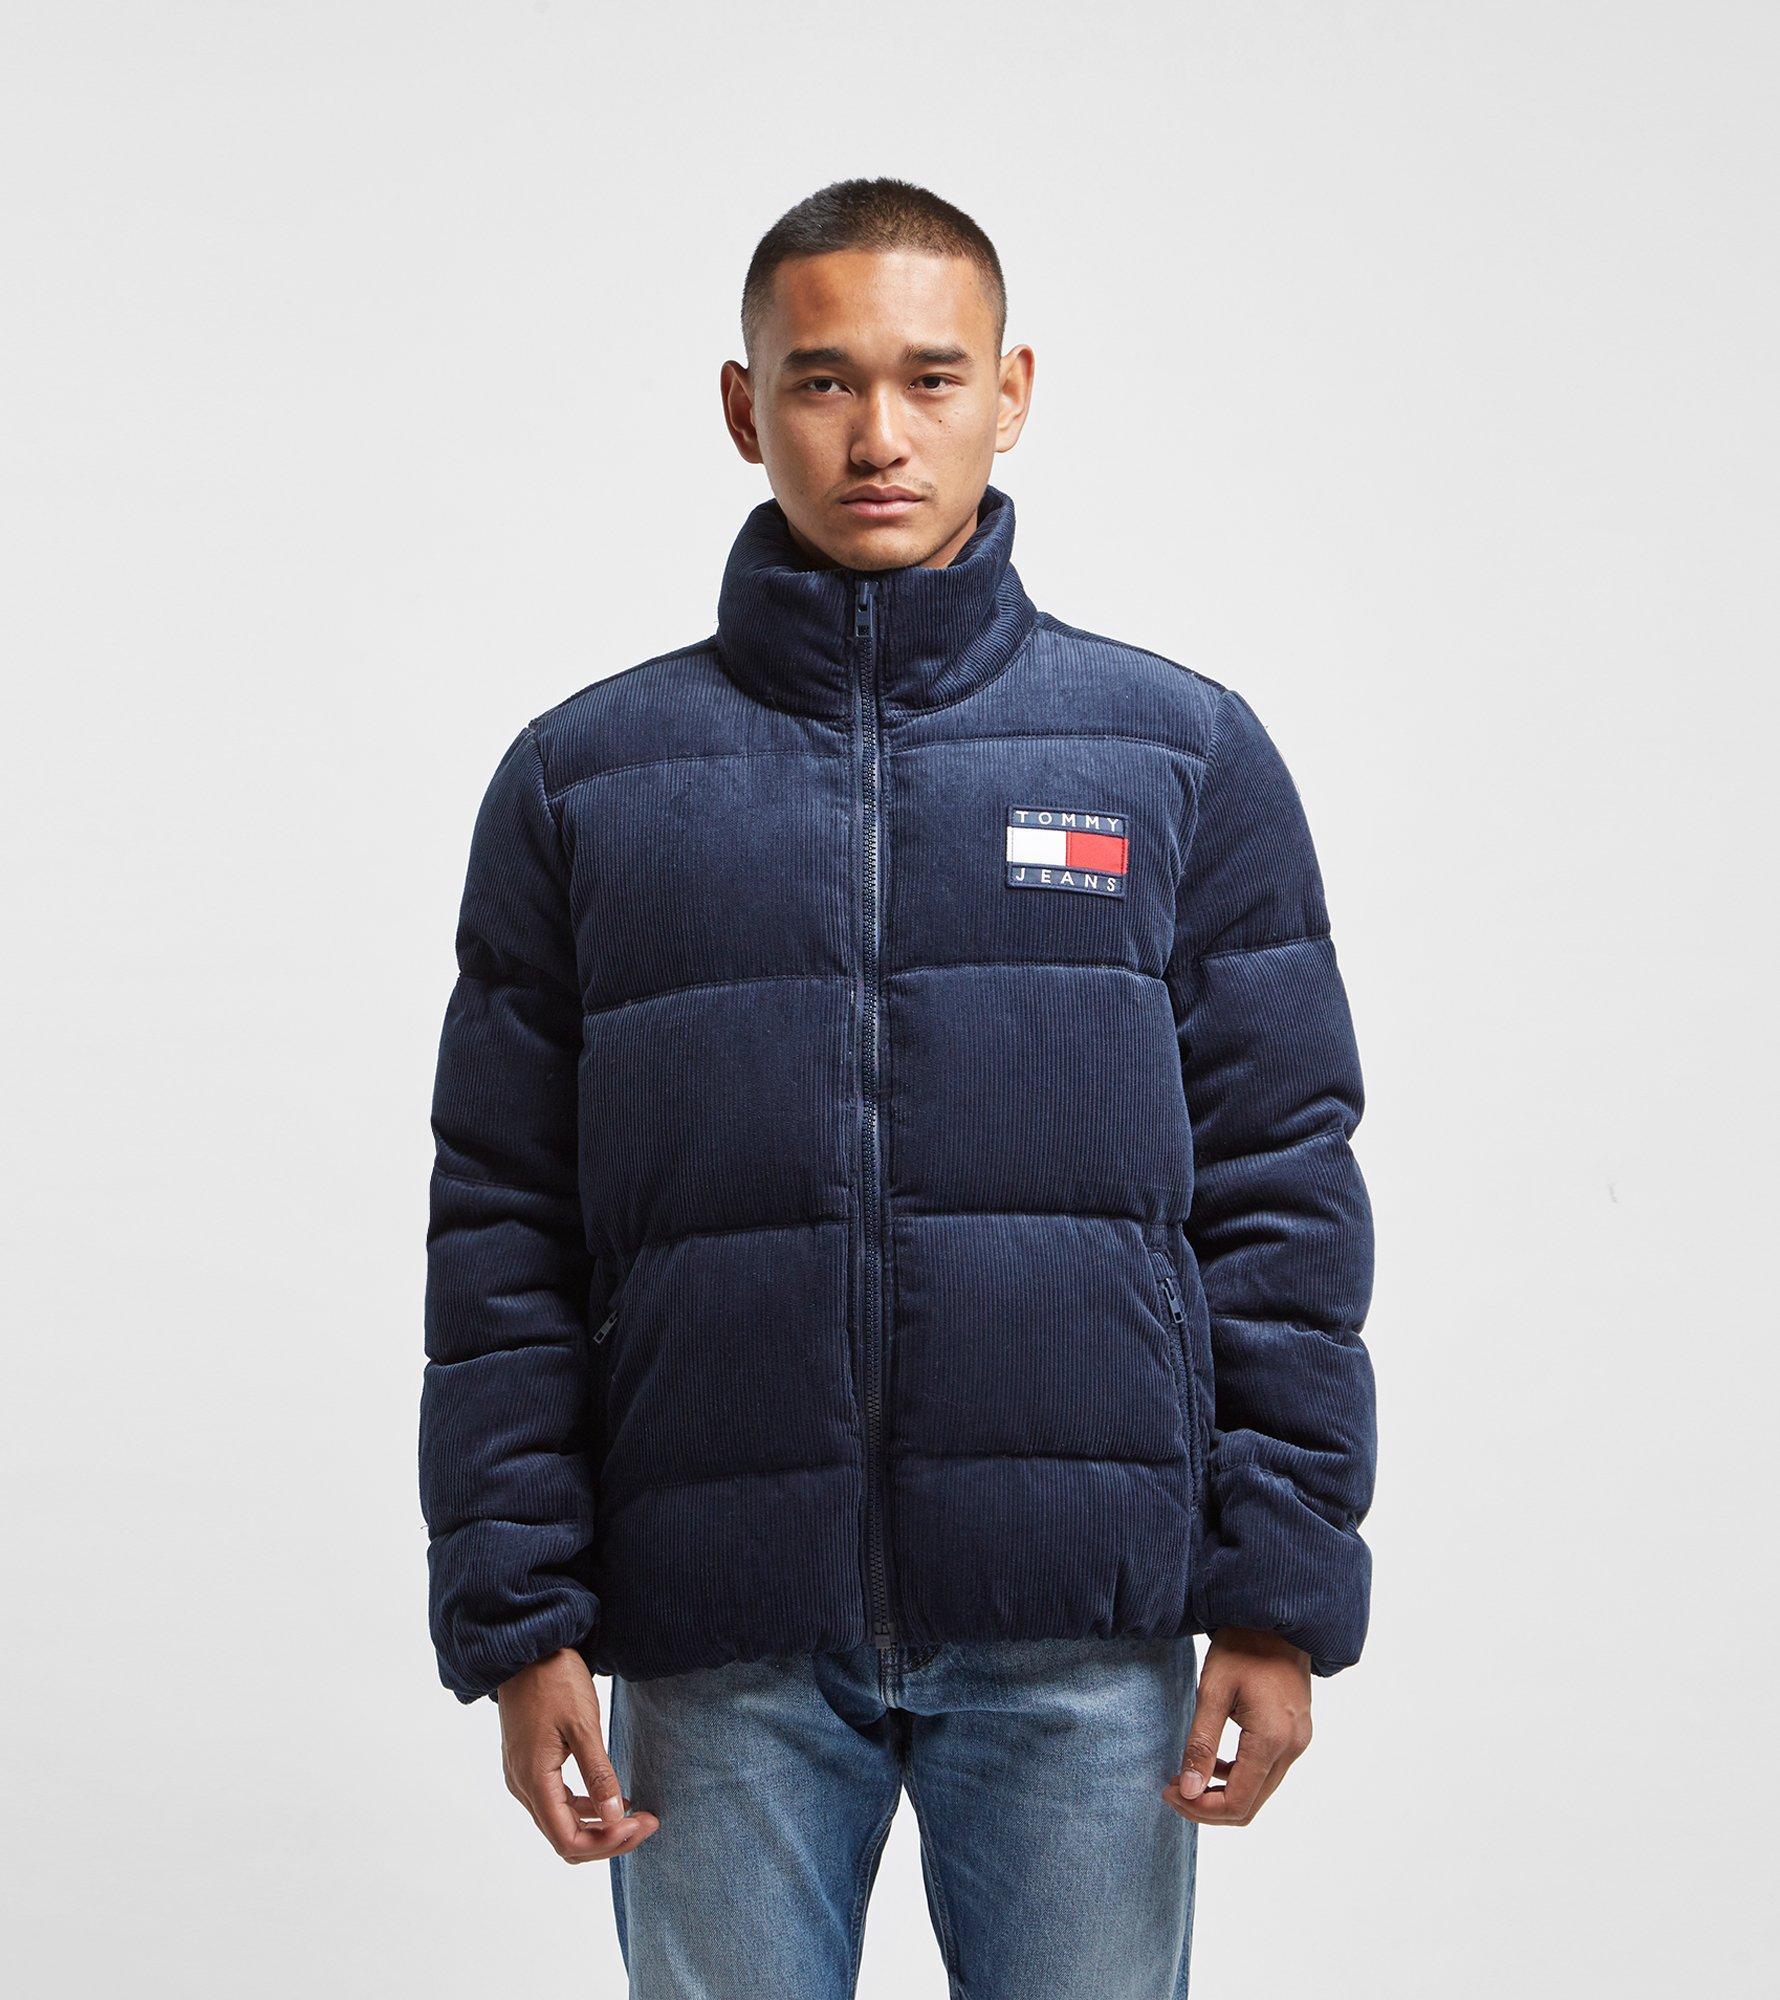 Tommy Hilfiger Corduroy Puffer Jacket in Blue for Men - Lyst